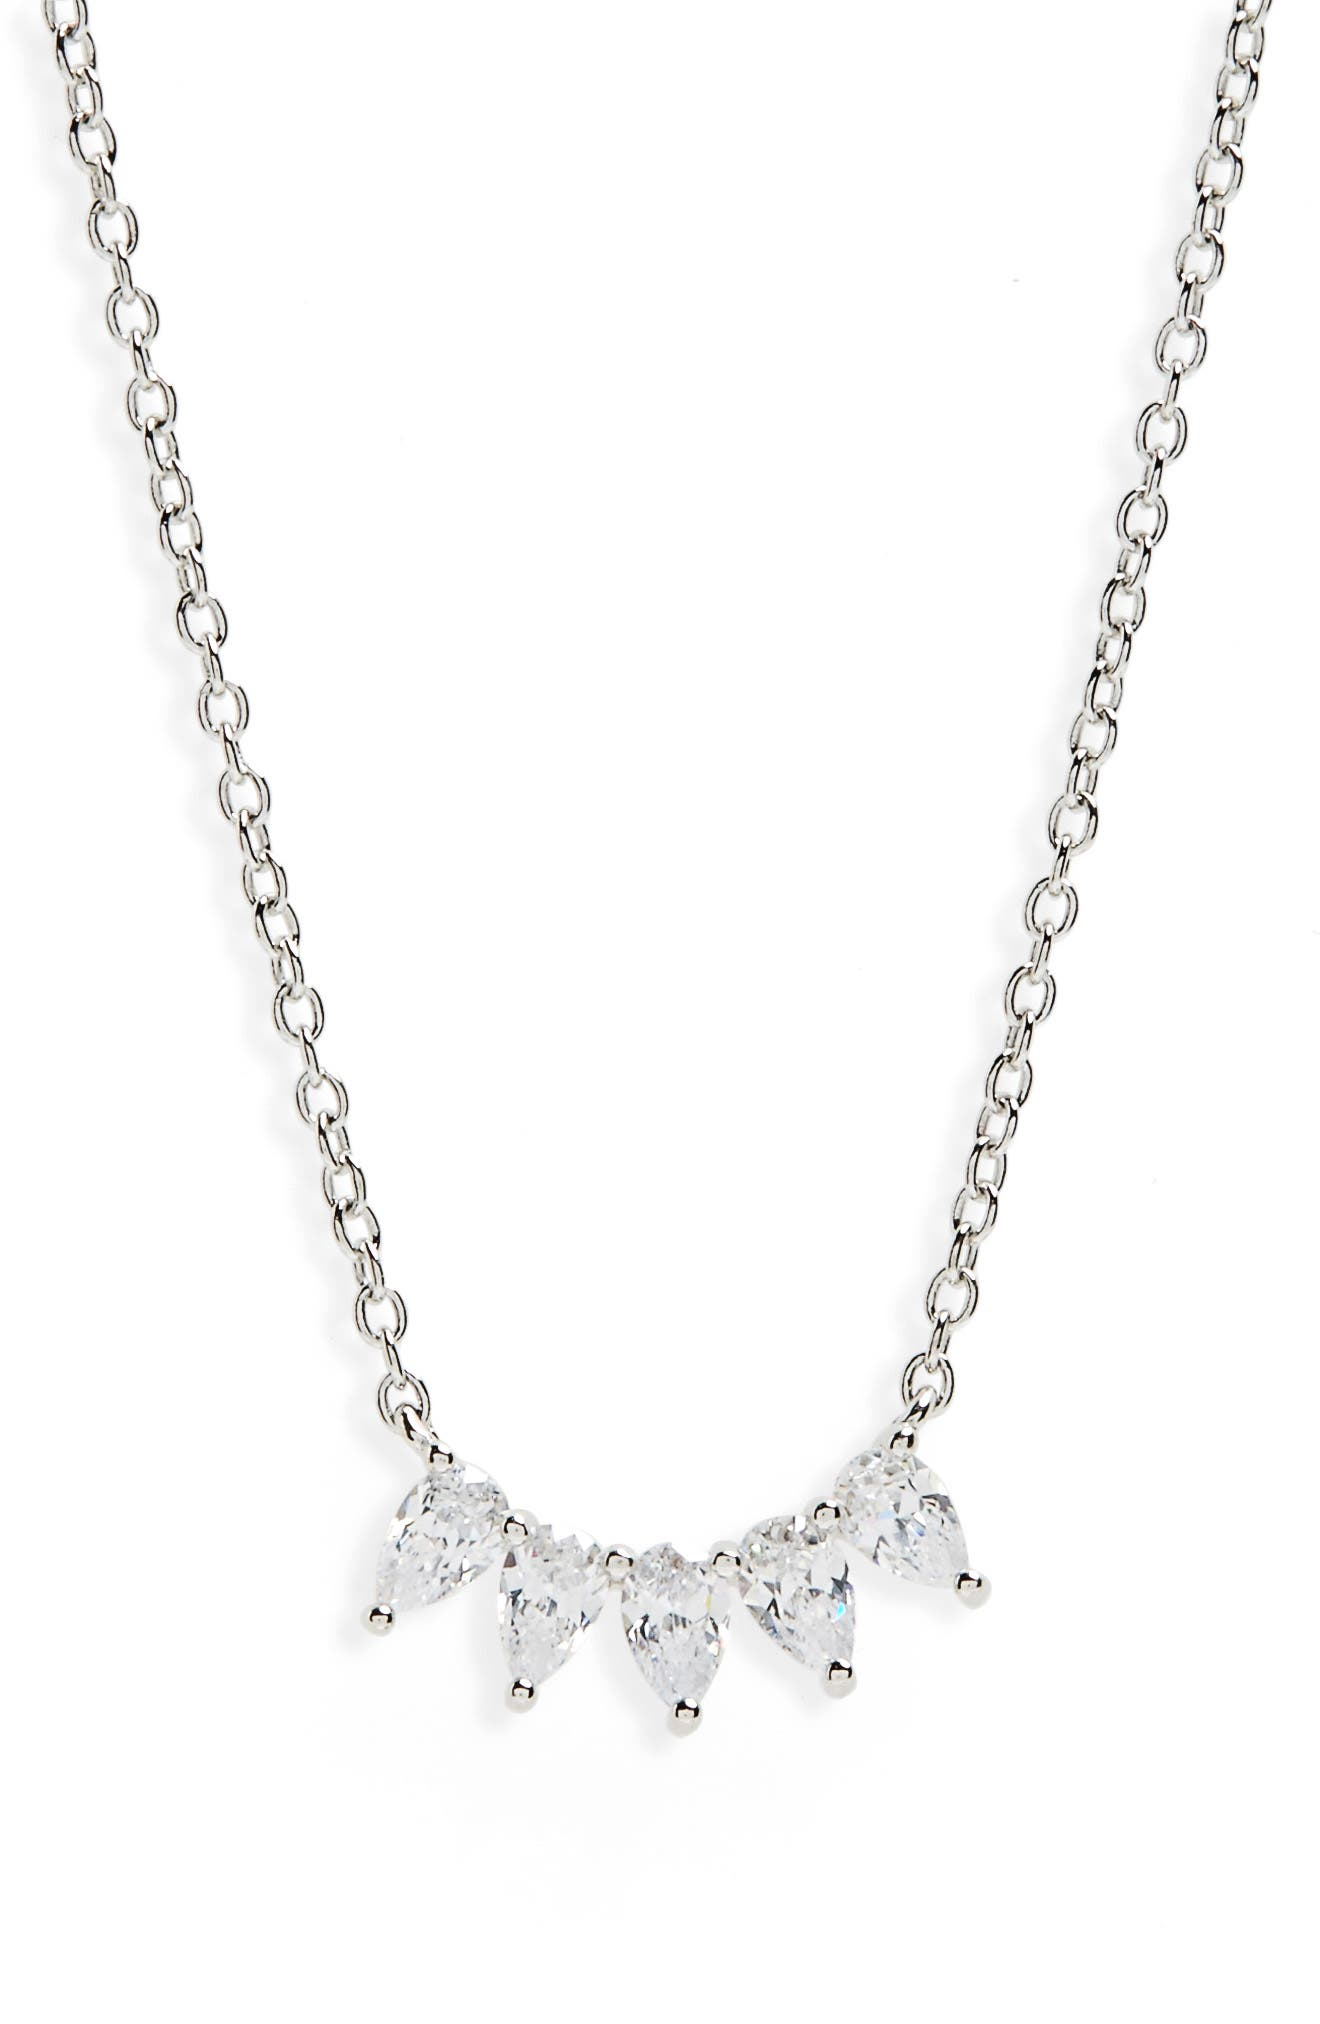 Marquise Cubic Zirconia Pendant Necklace,                             Main thumbnail 1, color,                             040